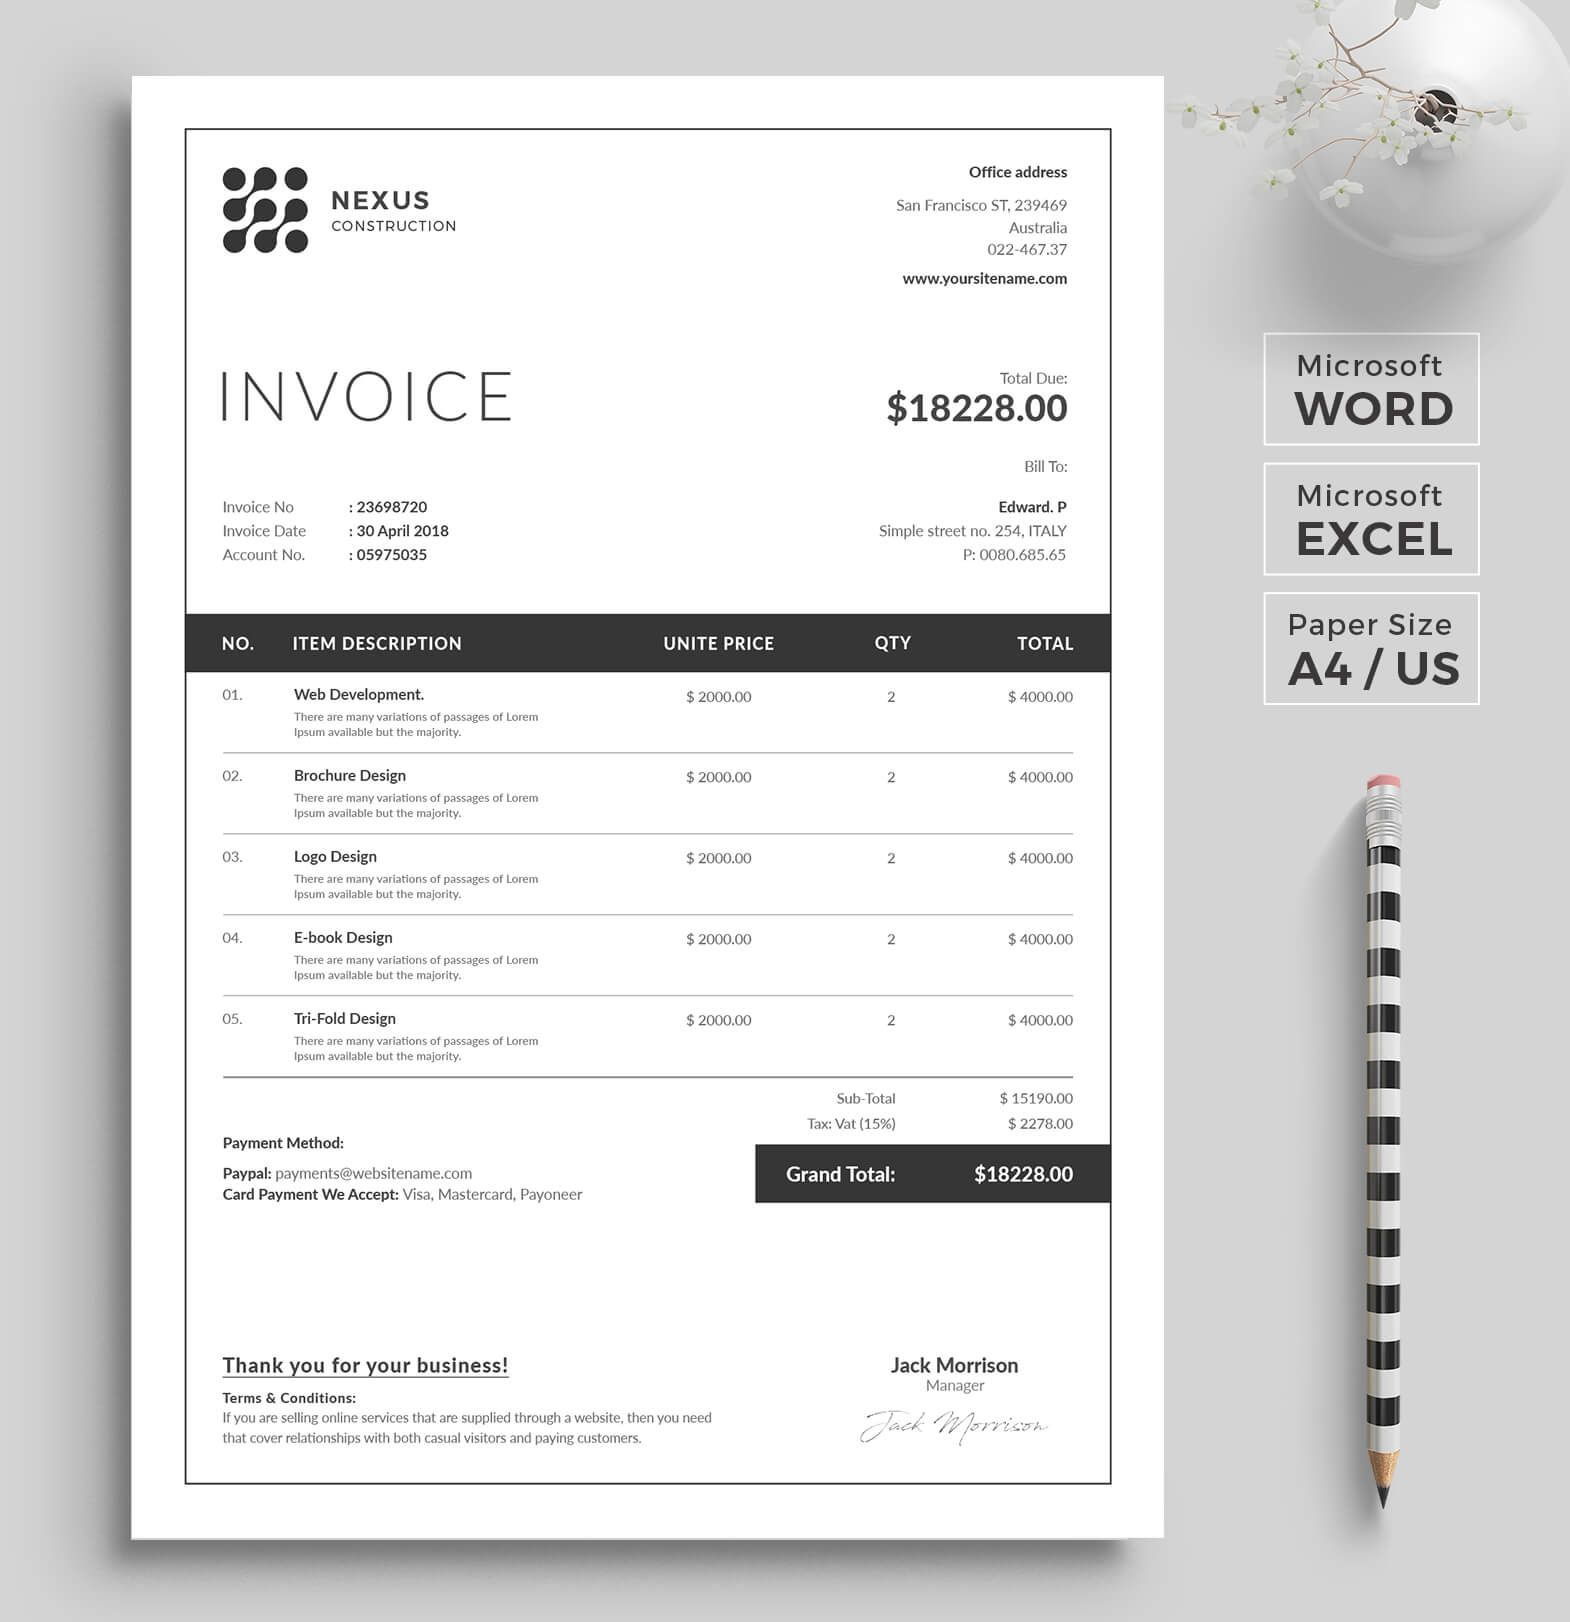 Invoice Template | Invoice Design | MS Excel  | Receipt | Word Invoice |  Business Invoice